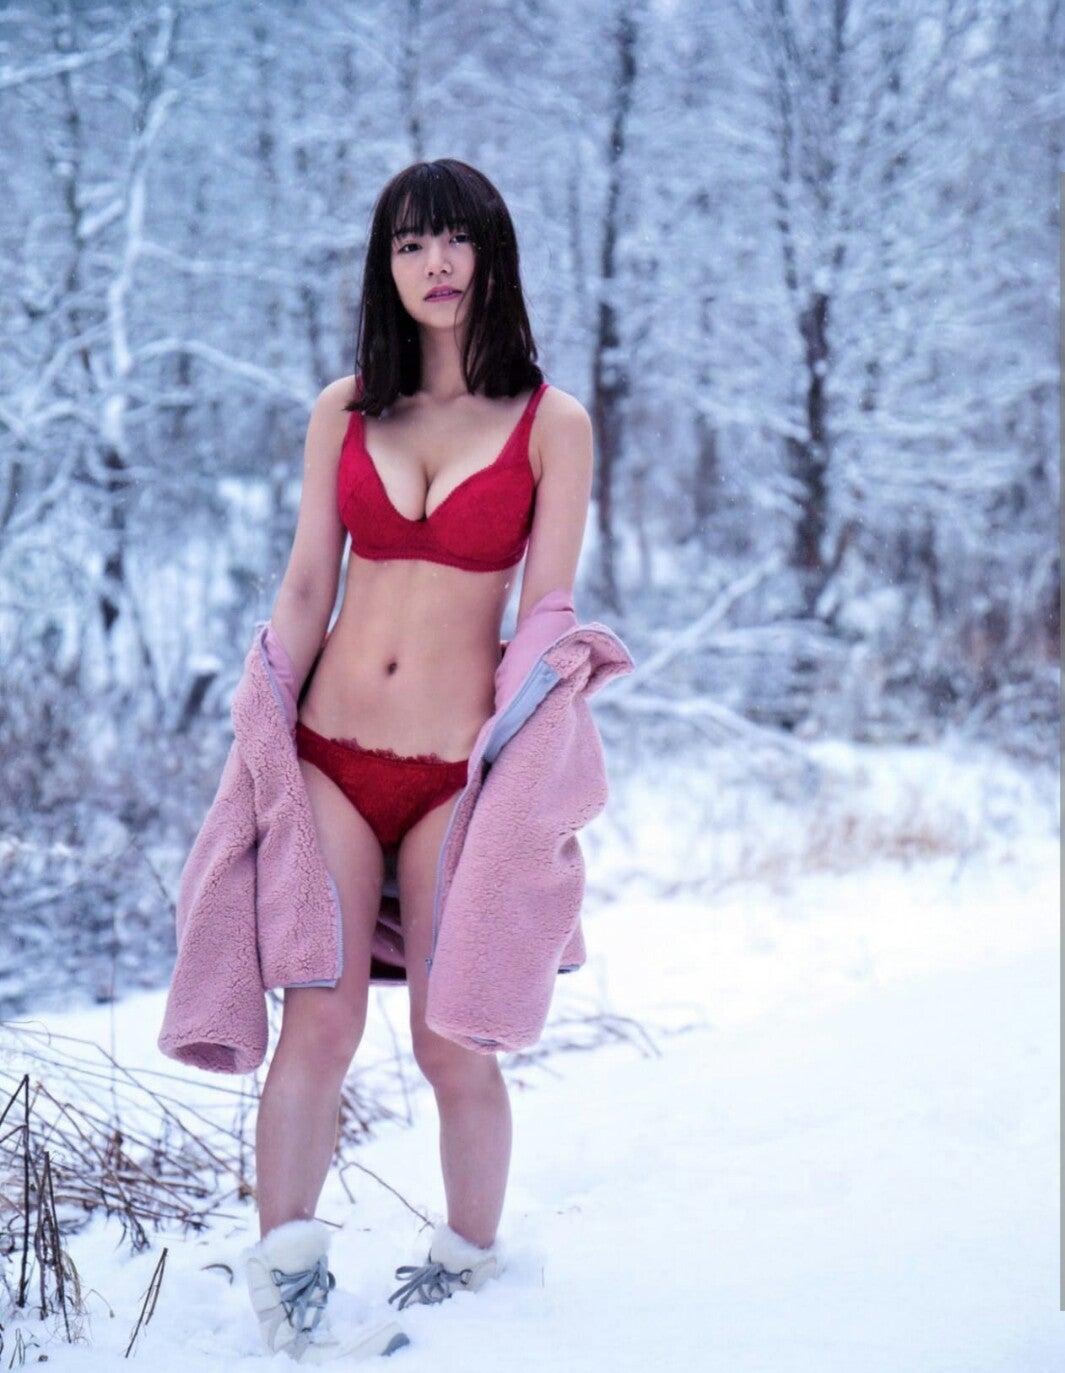 北野 日奈子 写真 集 空気 の 色